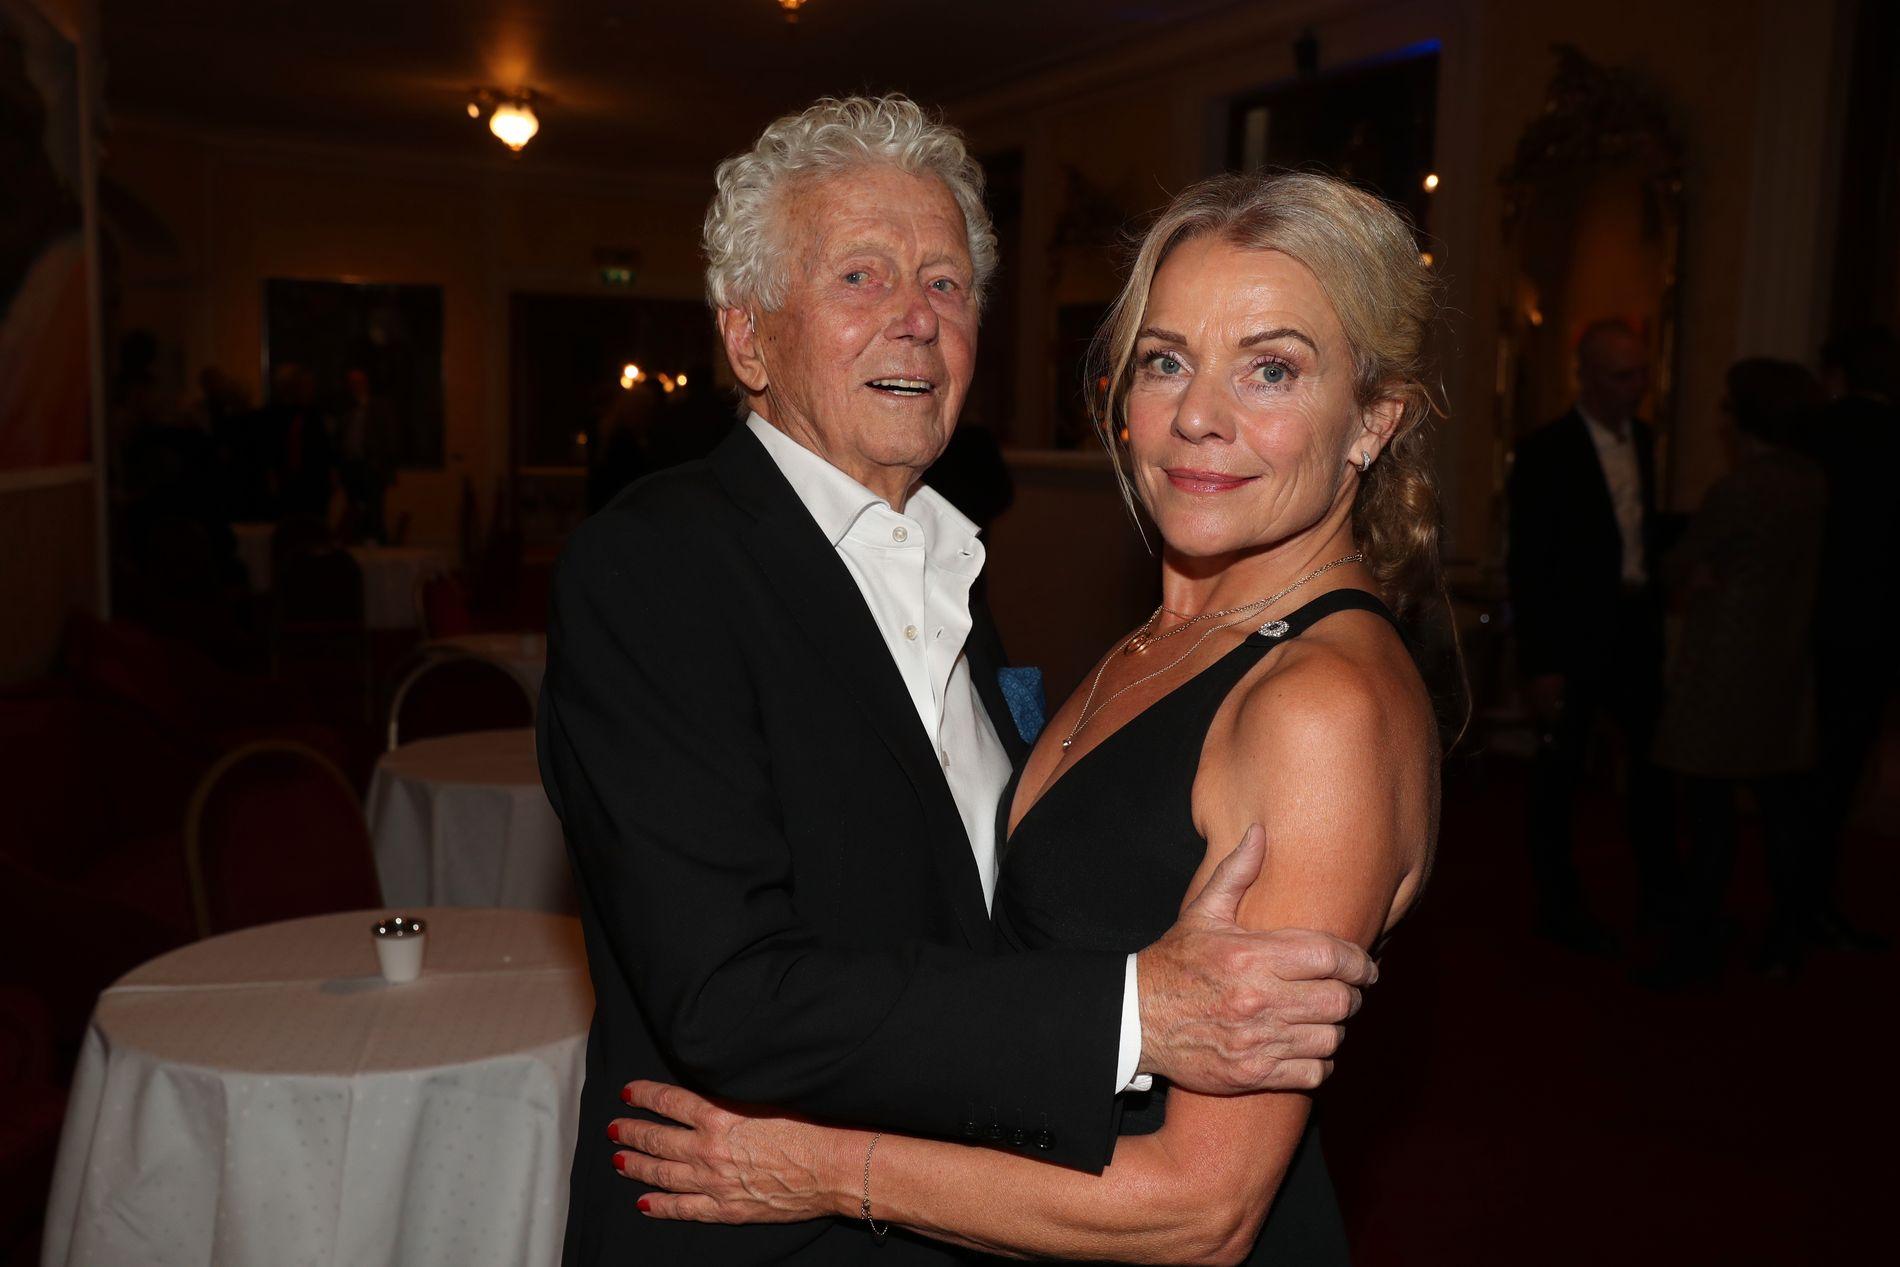 FEIRET 90 ÅRSDAGEN: Toralv Maurstad rundet 90 og ble feiret på behørig vis på Nationaltheatret. Her med kona Beate Eriksen.